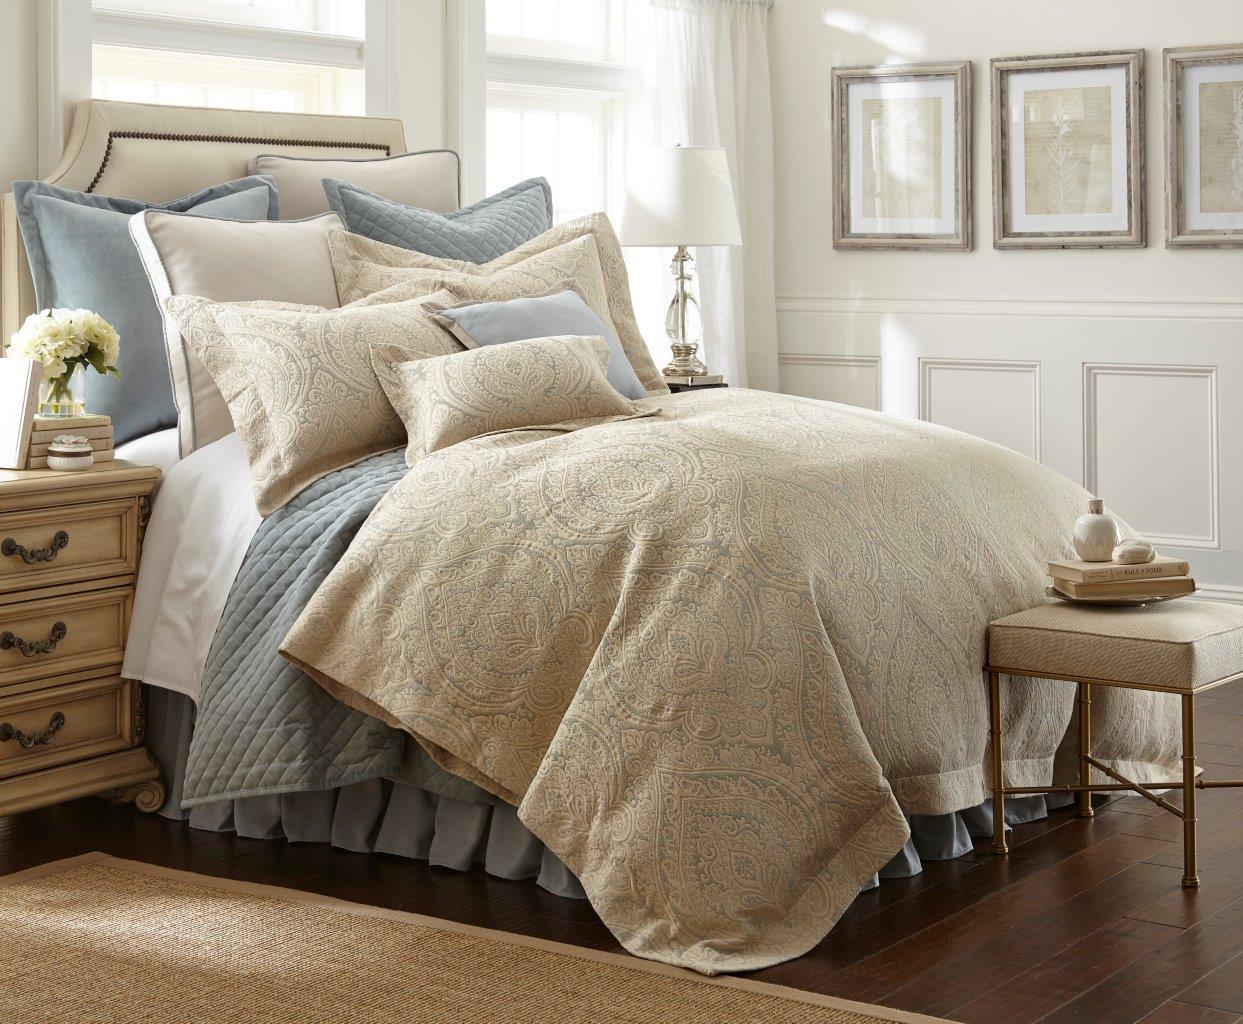 Abigail By Austin Horn Luxury Bedding Beddingsuperstore Com